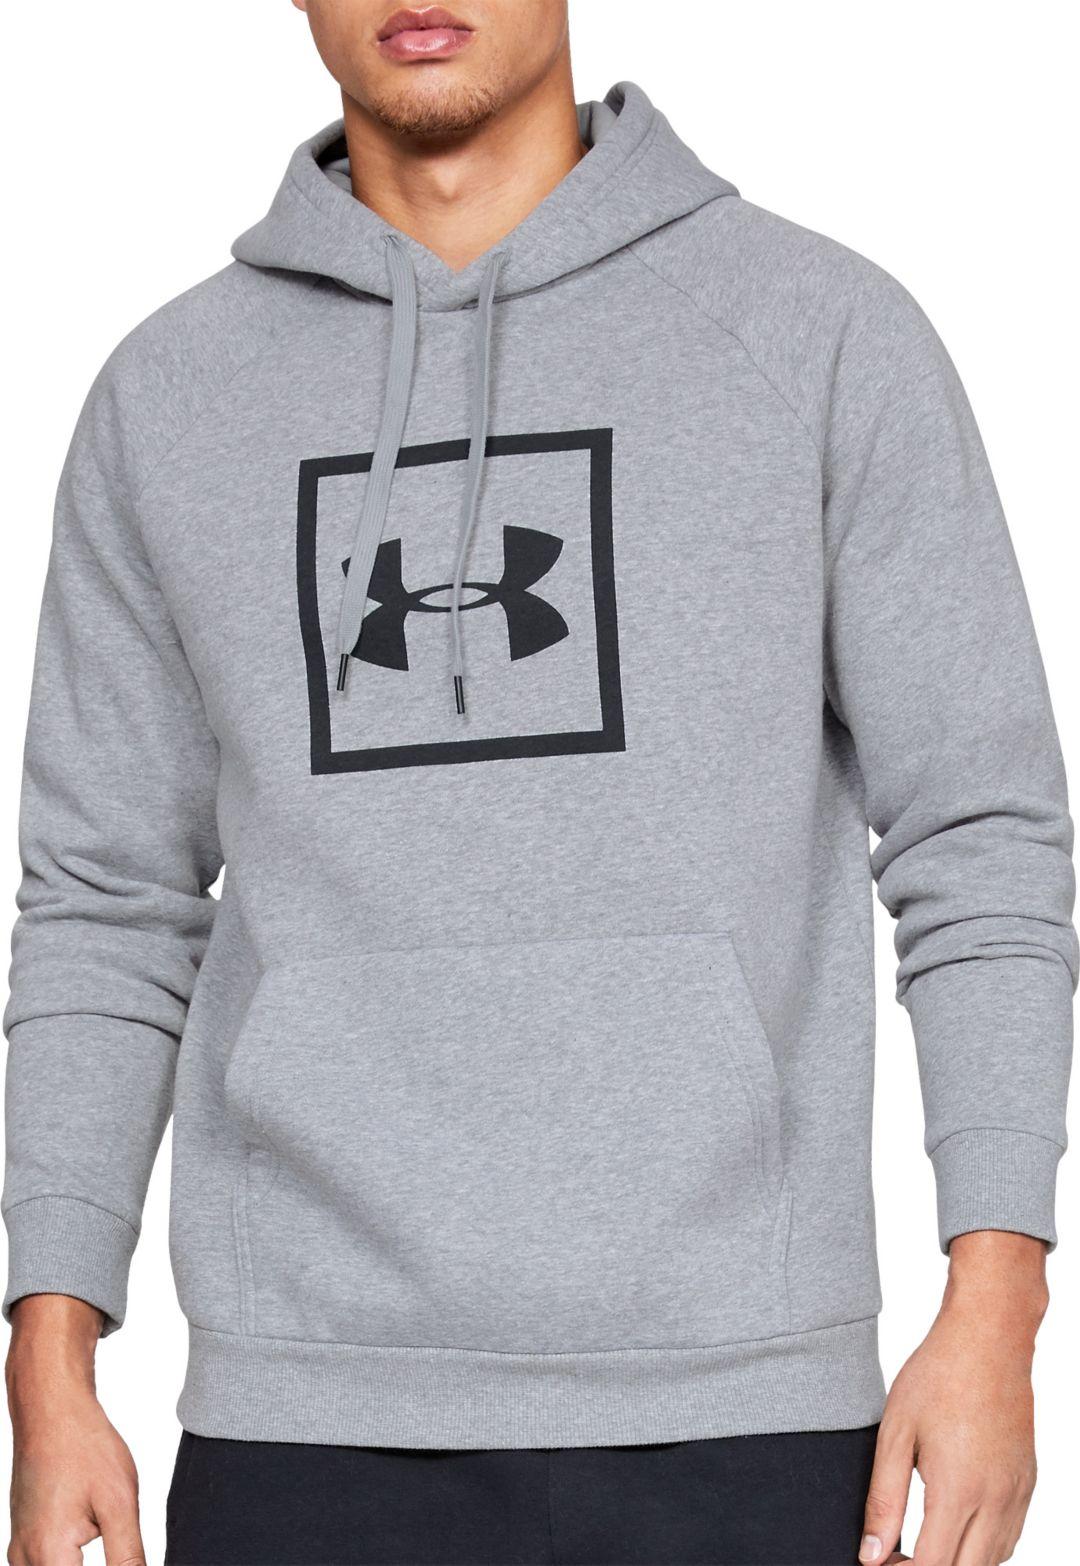 on wholesale pretty cheap 60% discount Under Armour Men's Rival Fleece Logo Hoodie